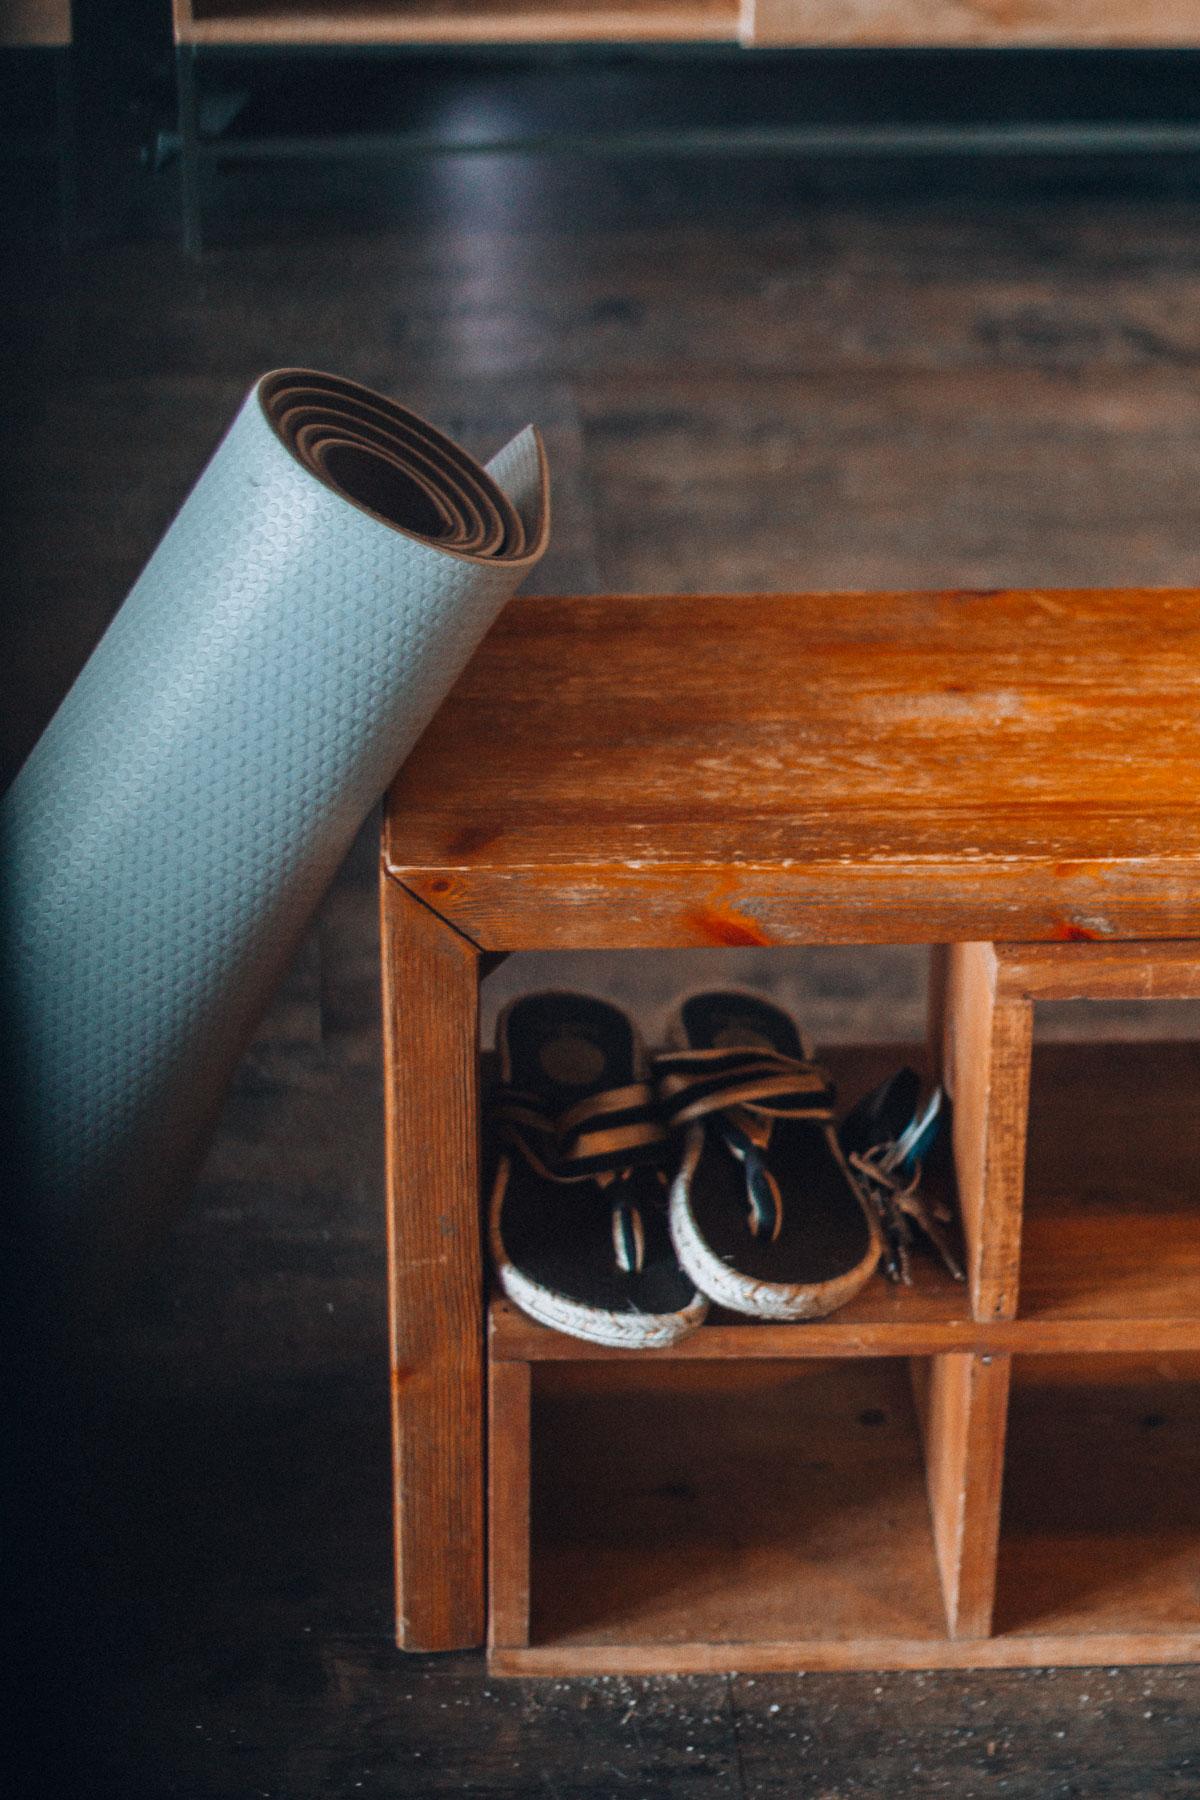 Nahlo Yoga Mat Espadrilles Yoga Shoes Boho Sandals